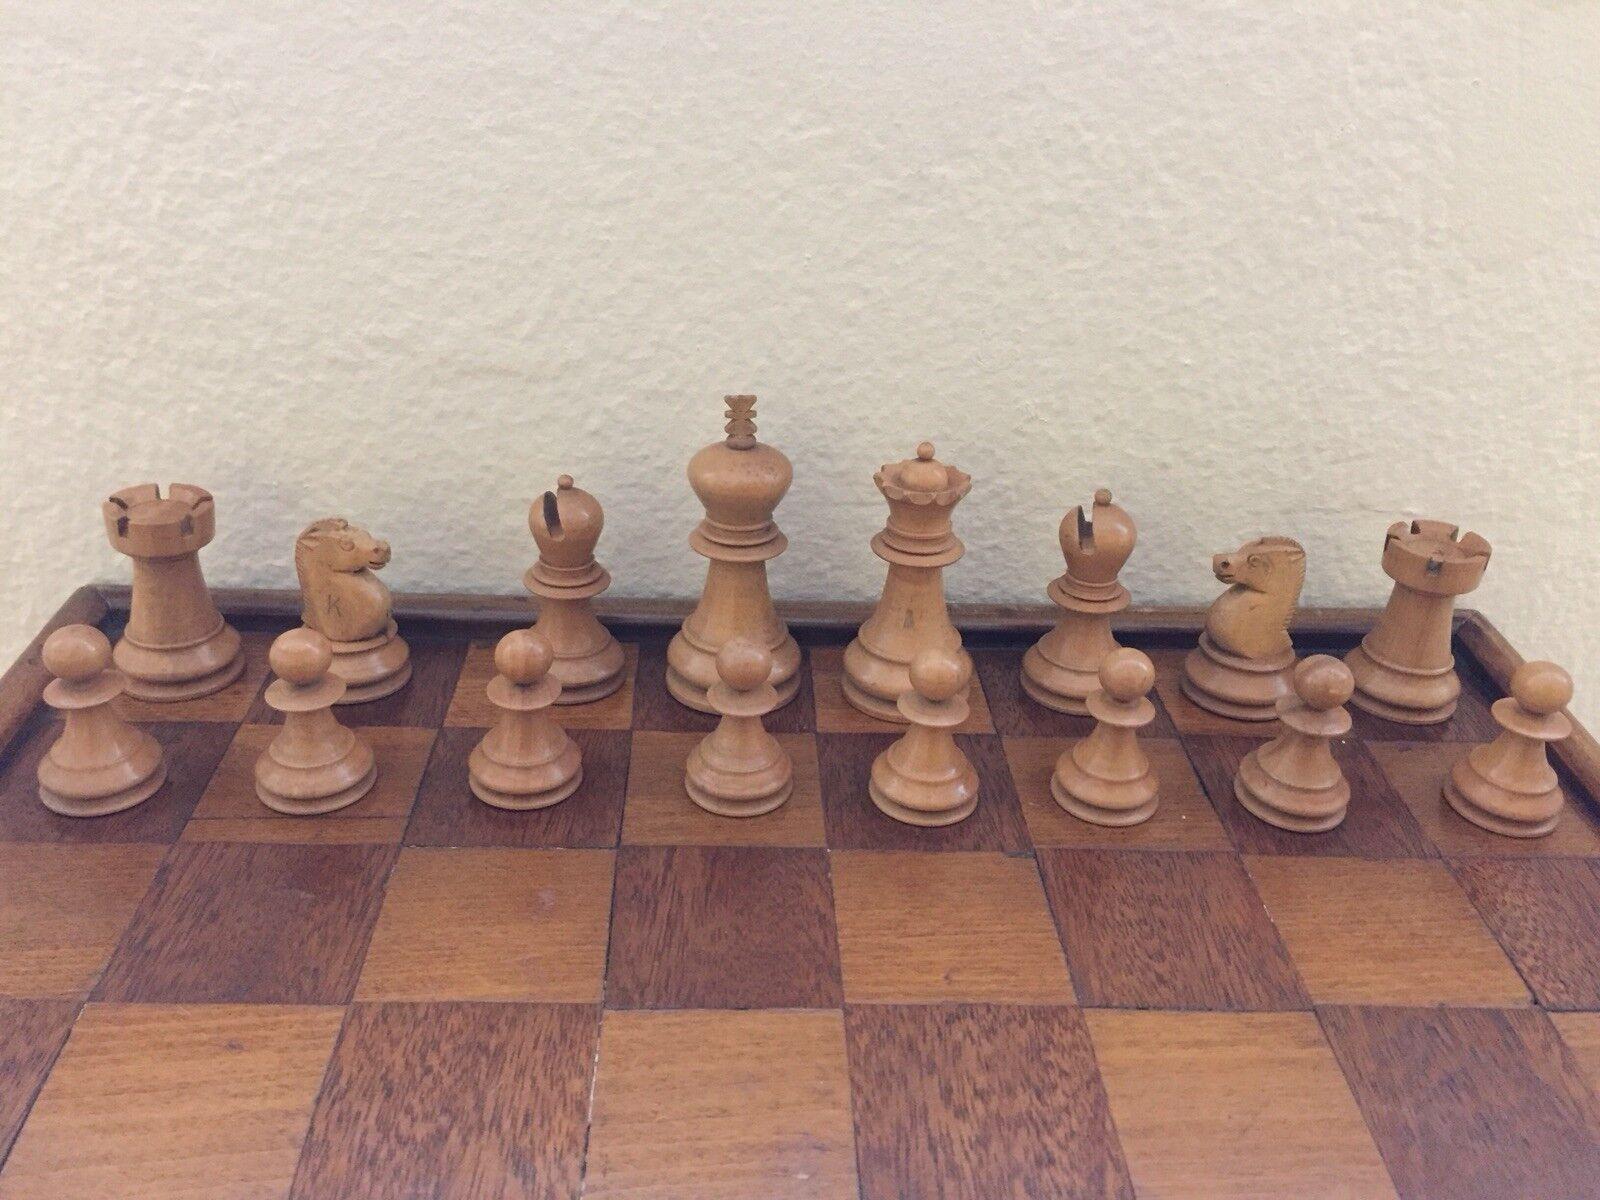 Richard Whitty Vintage juego de ajedrez con tablero de ajedrez plegable.